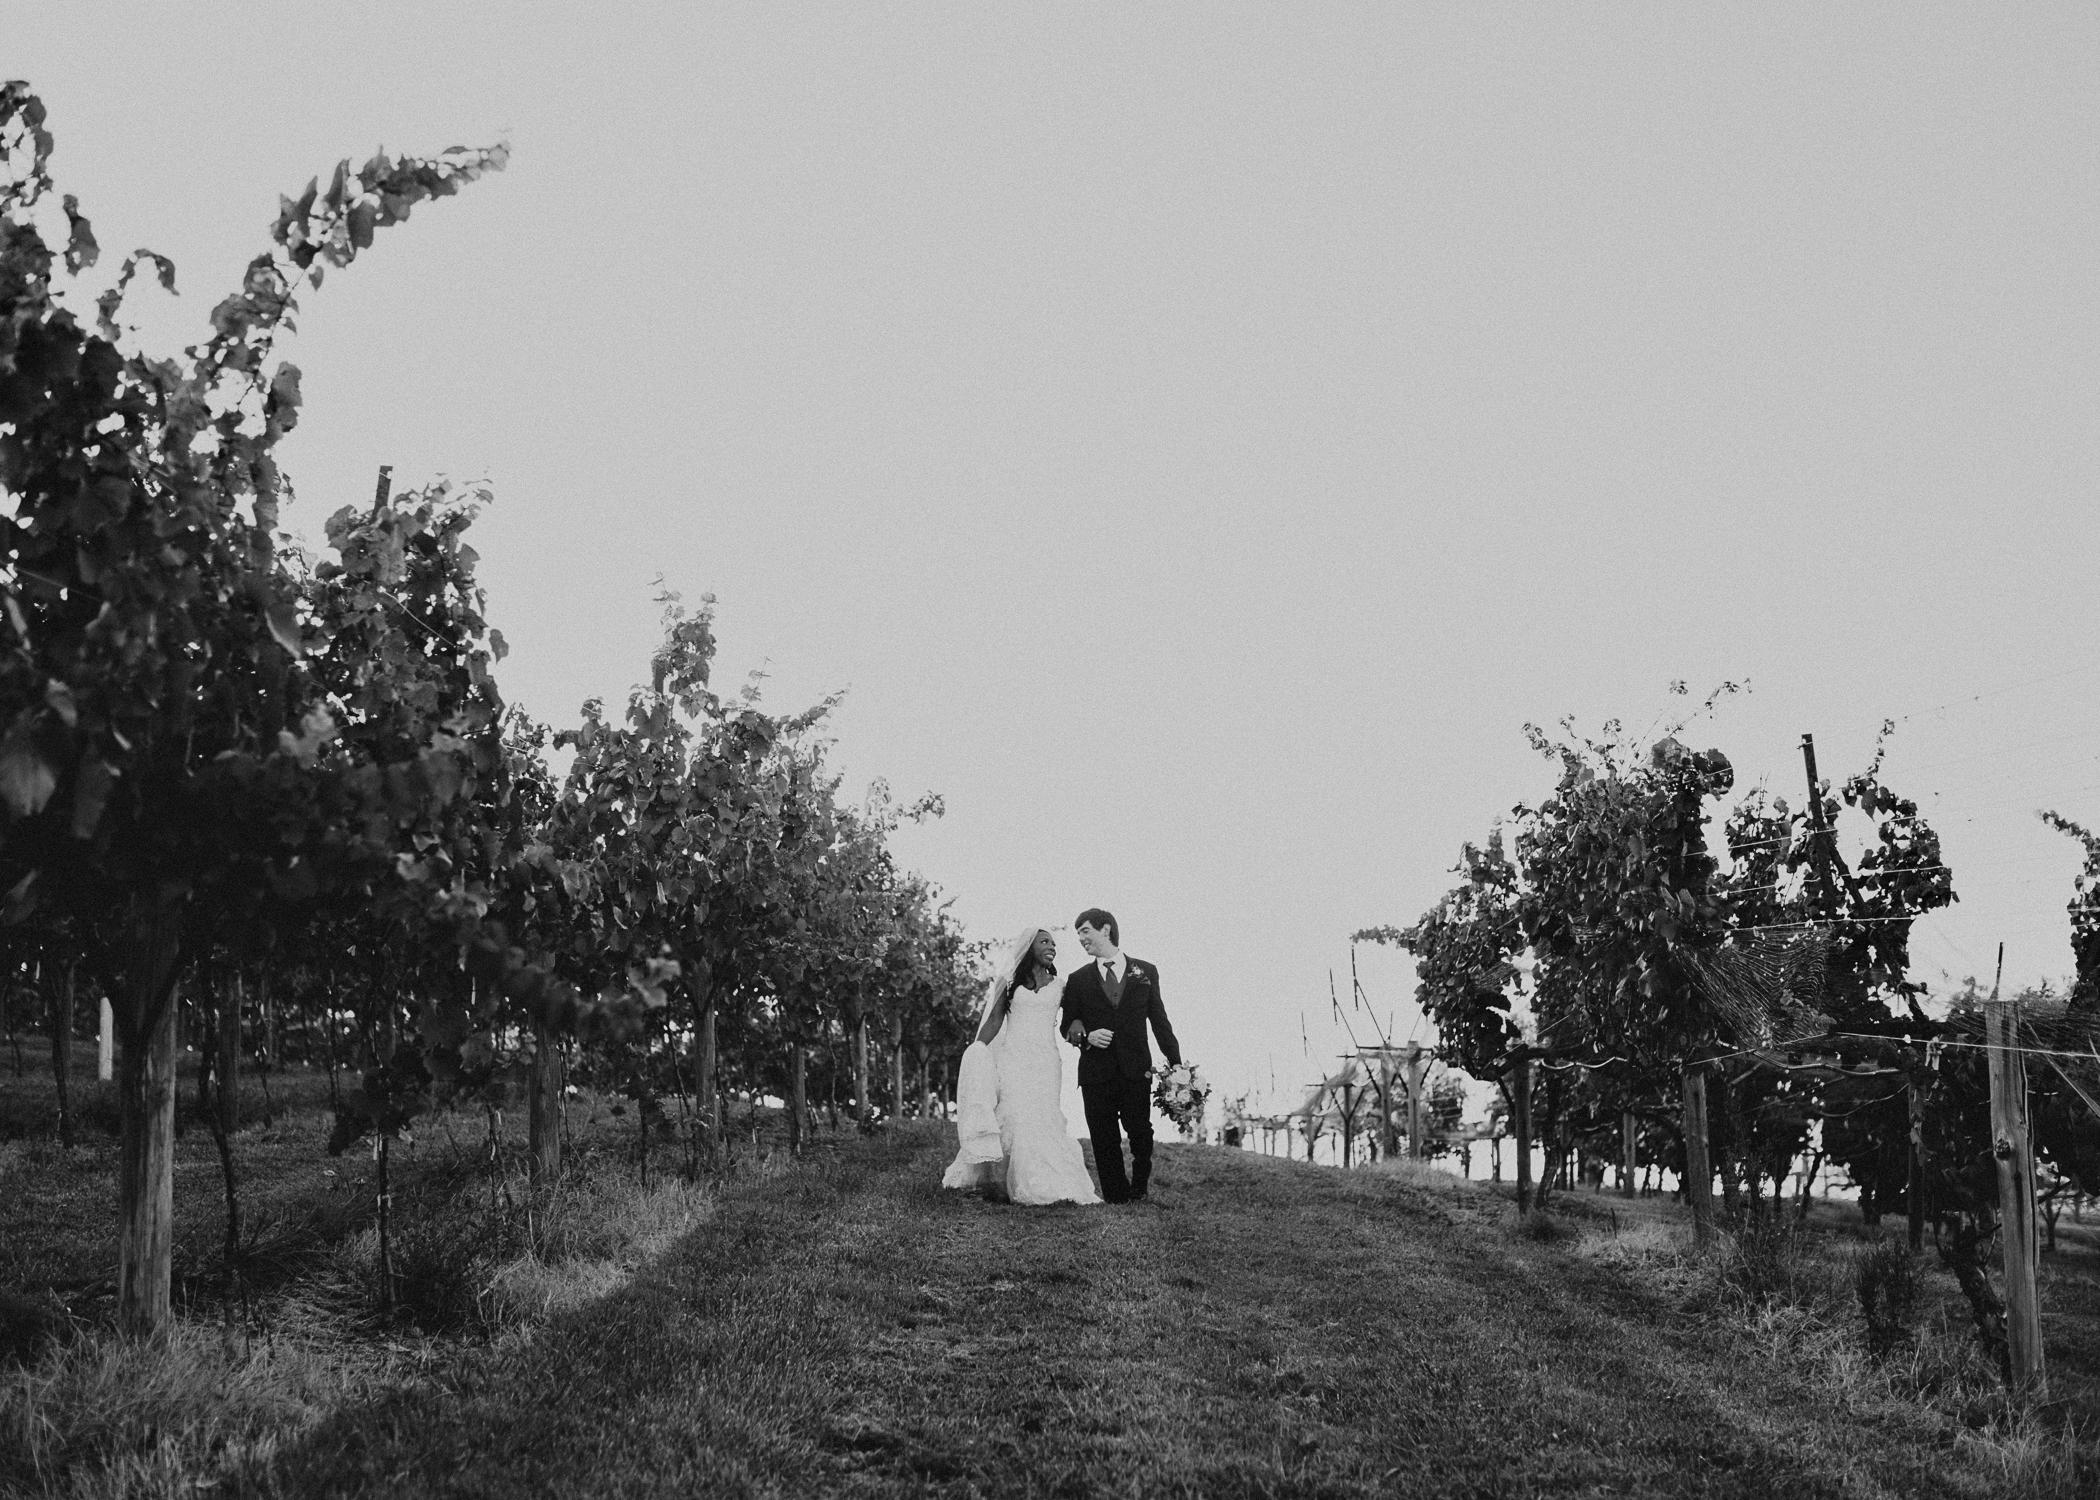 57- Kaya_vineyard_dahlonega_wedding_venue_bride_groom_portraits_aline_marin_photography.jpg